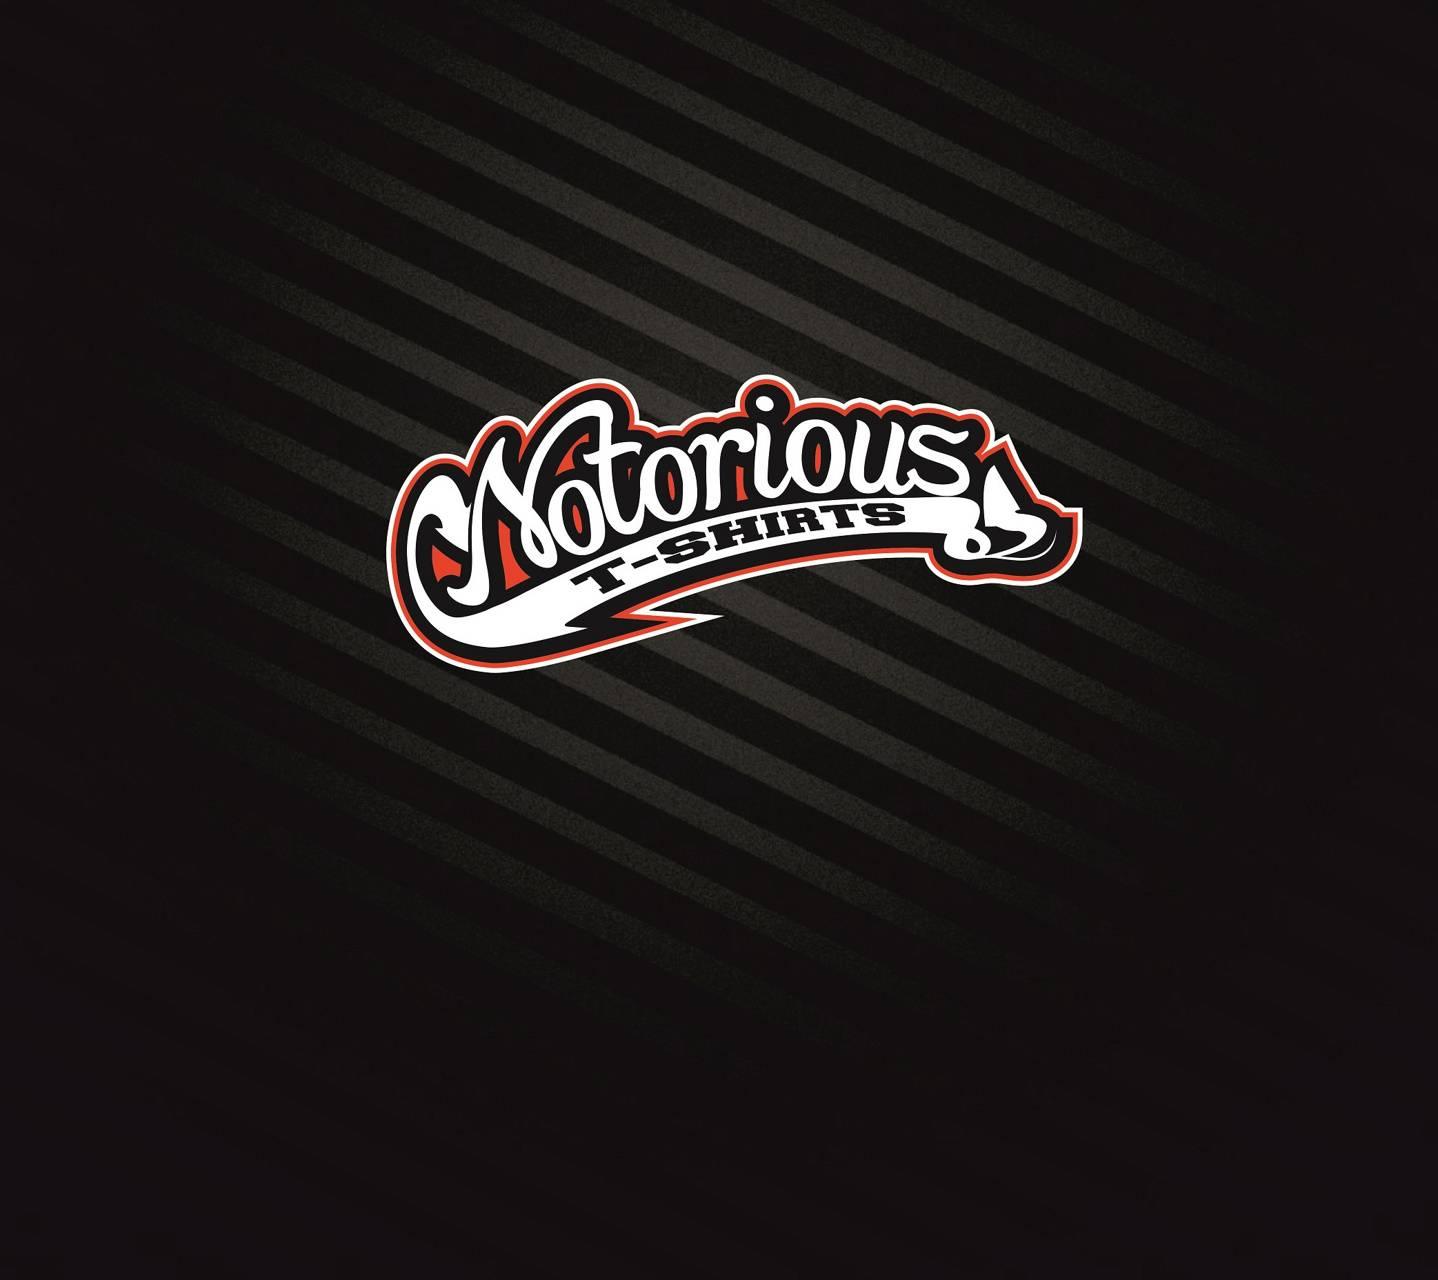 notorious brand